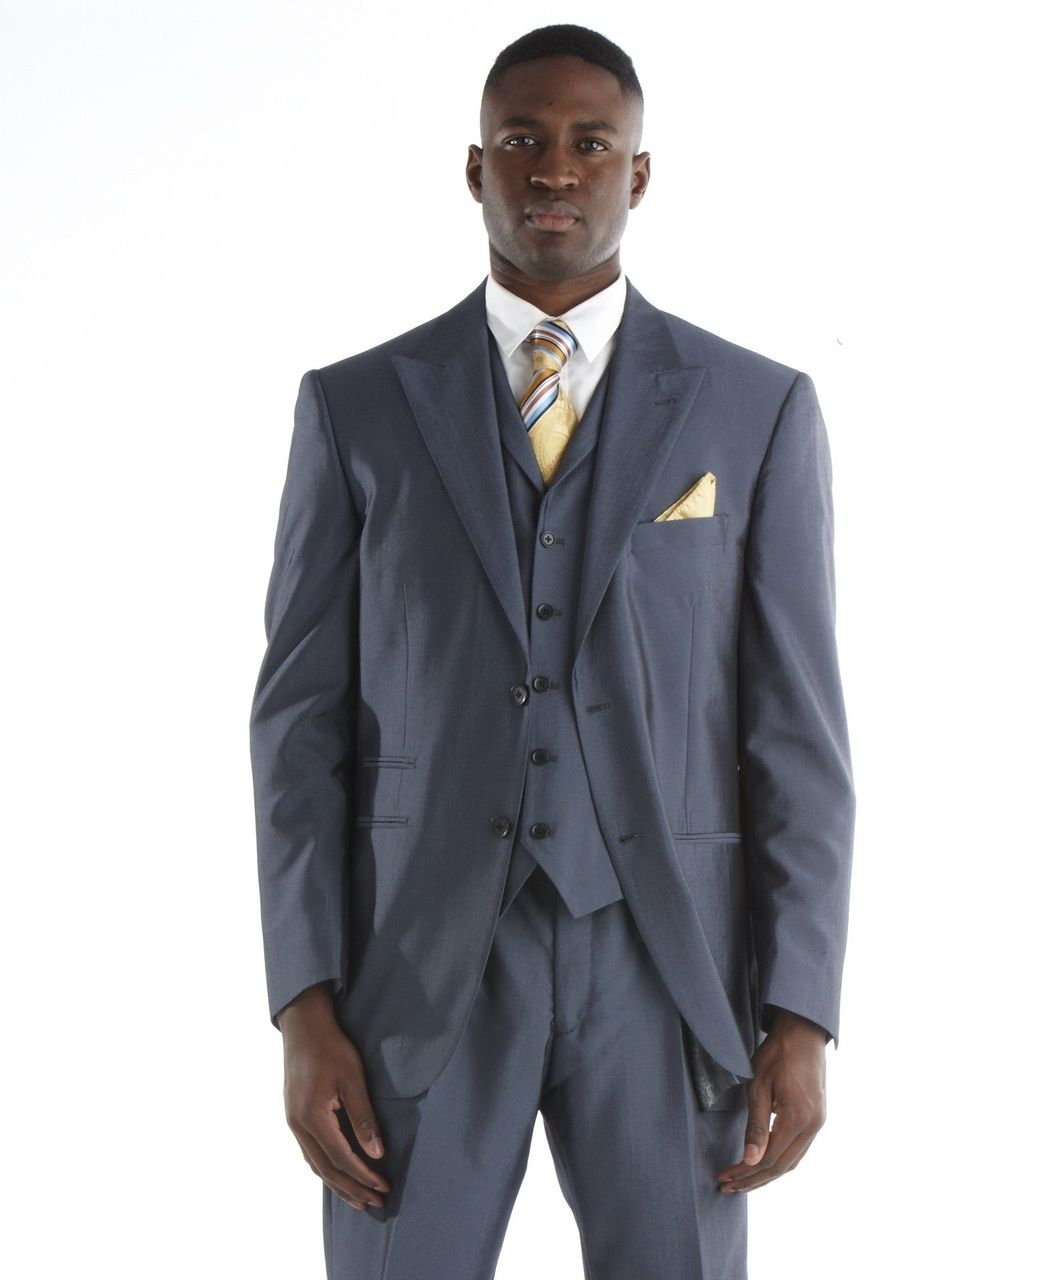 Steve Harvey Sharkskin 3 Pc. Suit - Midnight Blue